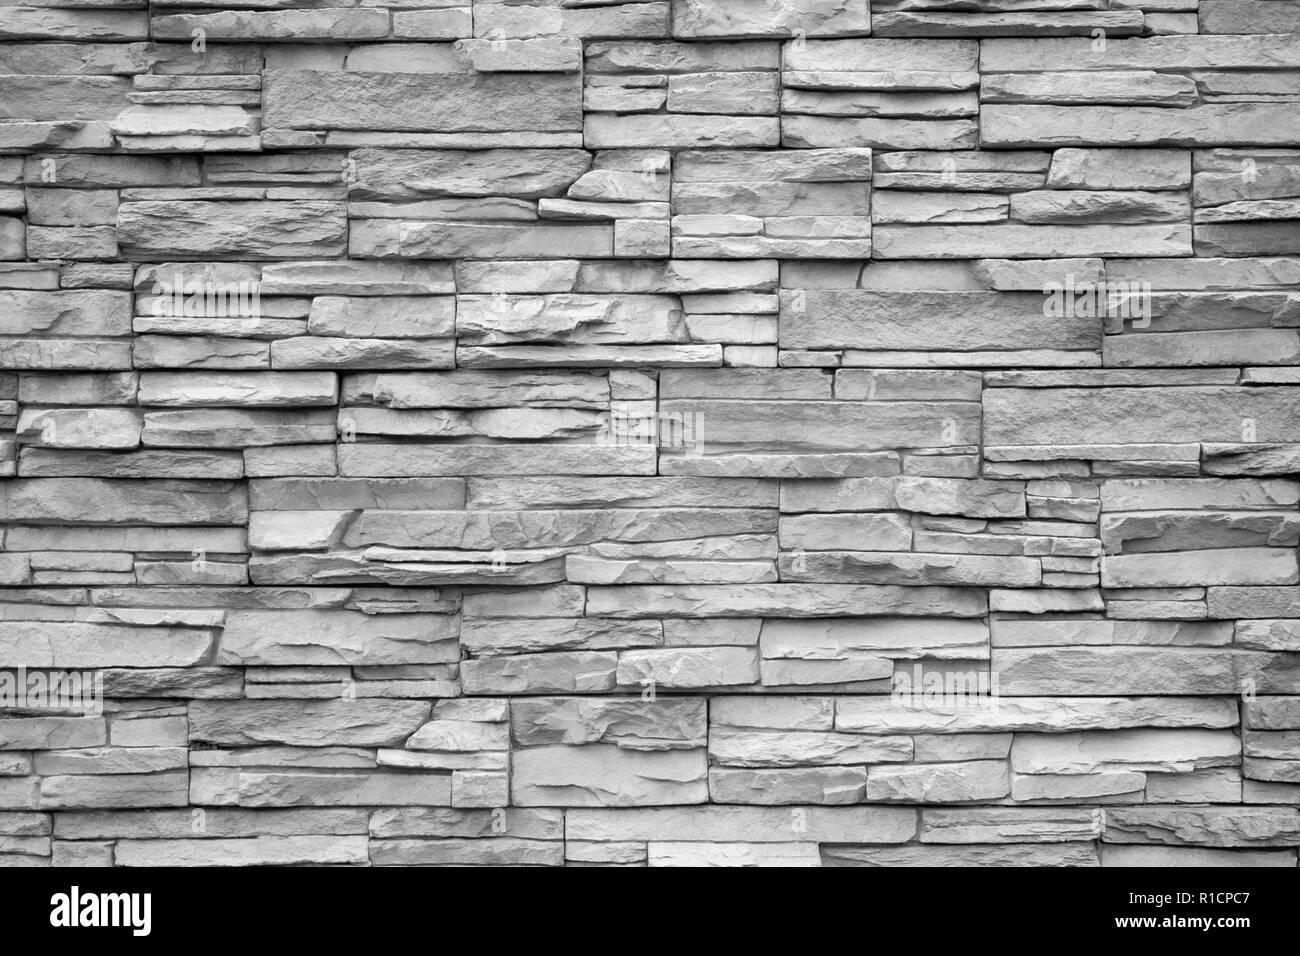 Stone Tiles Texture Decorative Stones Background Bricks Texture